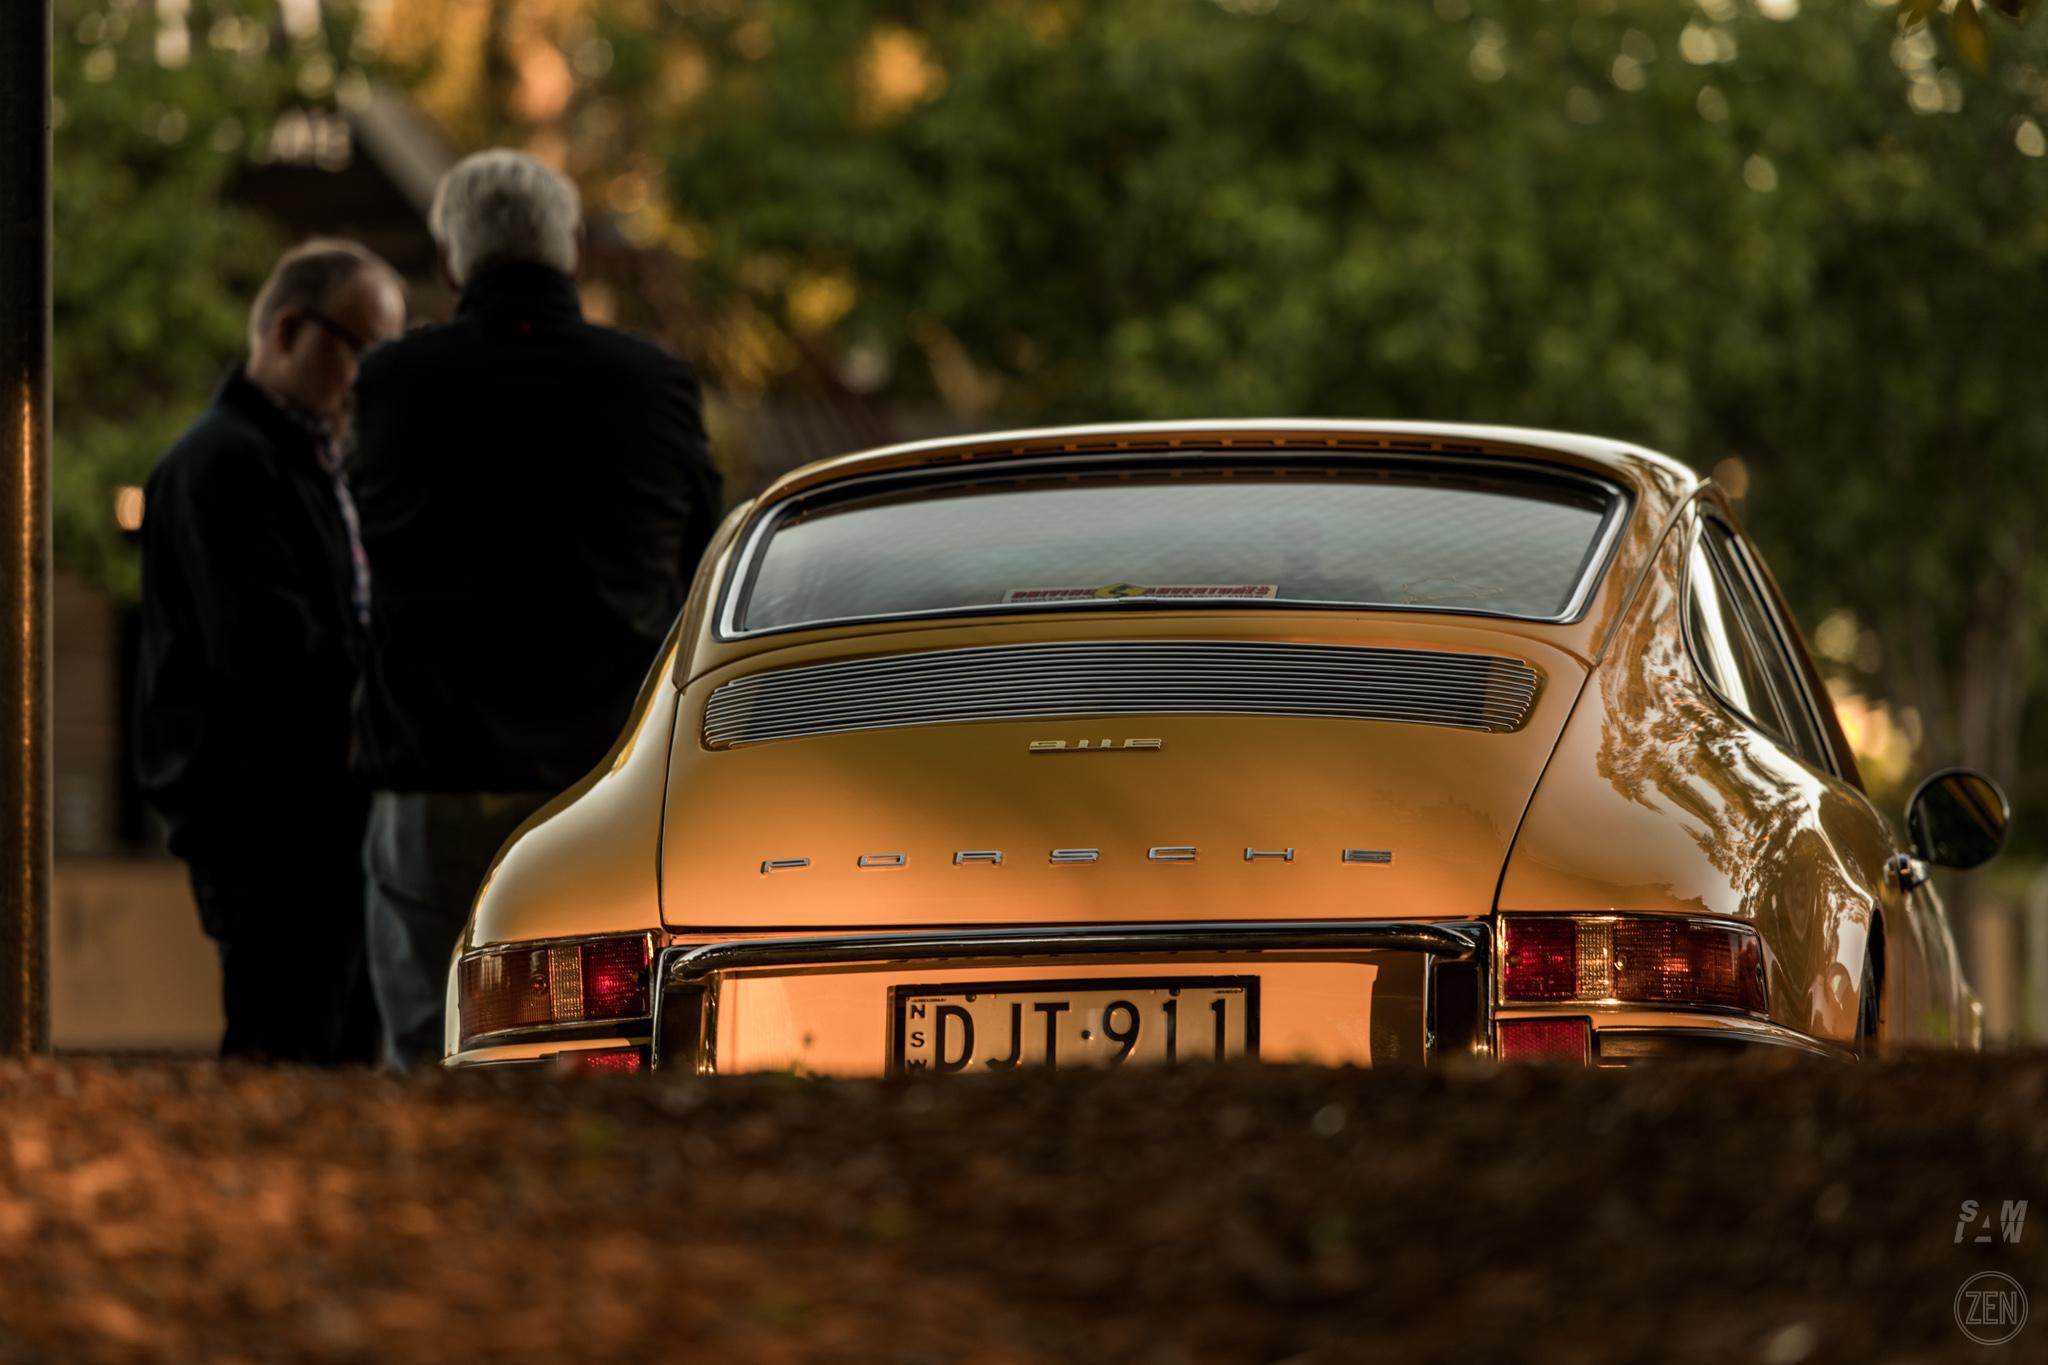 2019-10-27 - Autohaus Porsches & Coffee 011